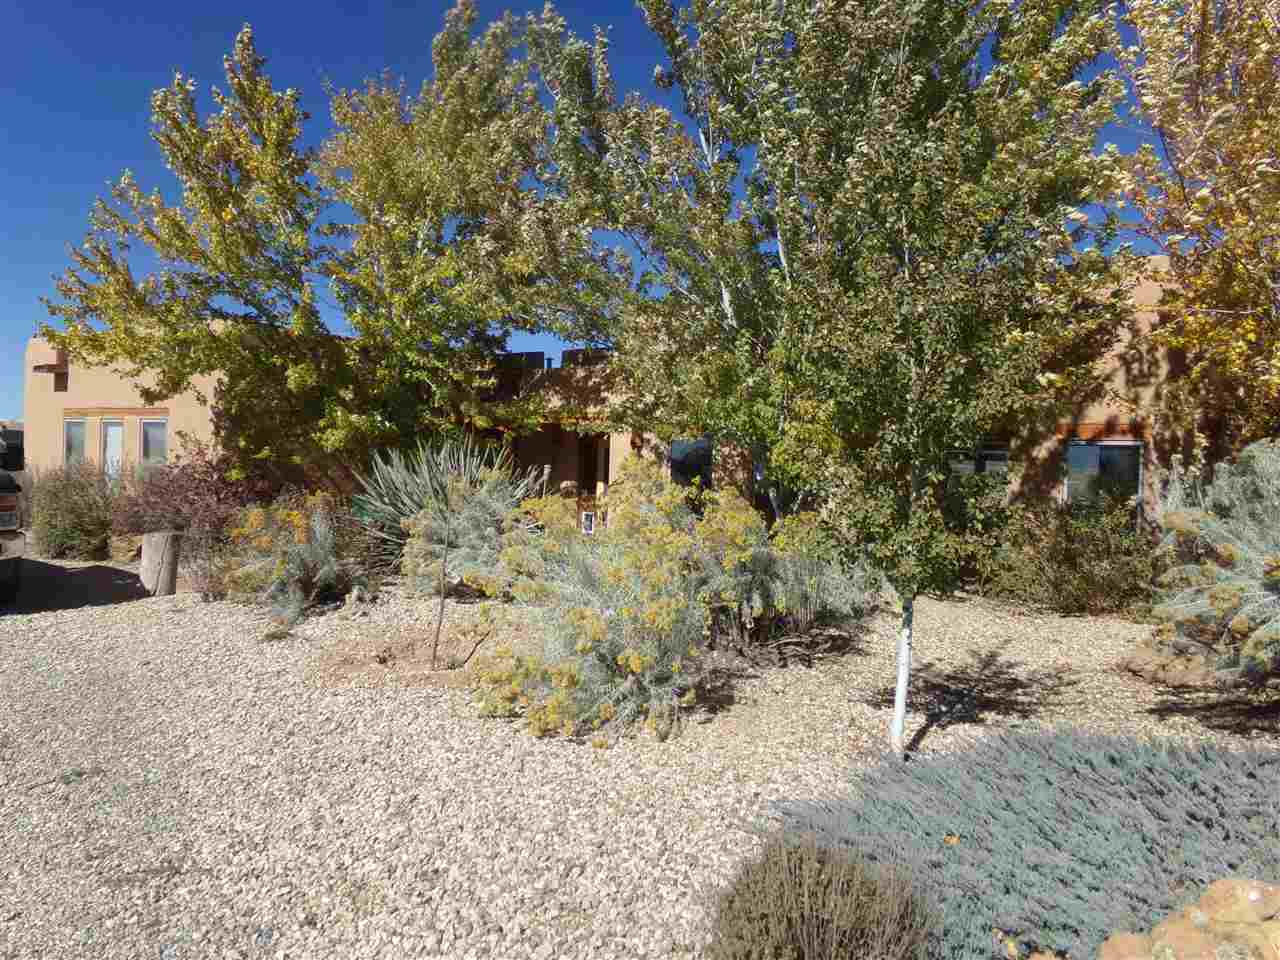 1035 Sunshine Rd., Ranchos de Taos, NM 87557